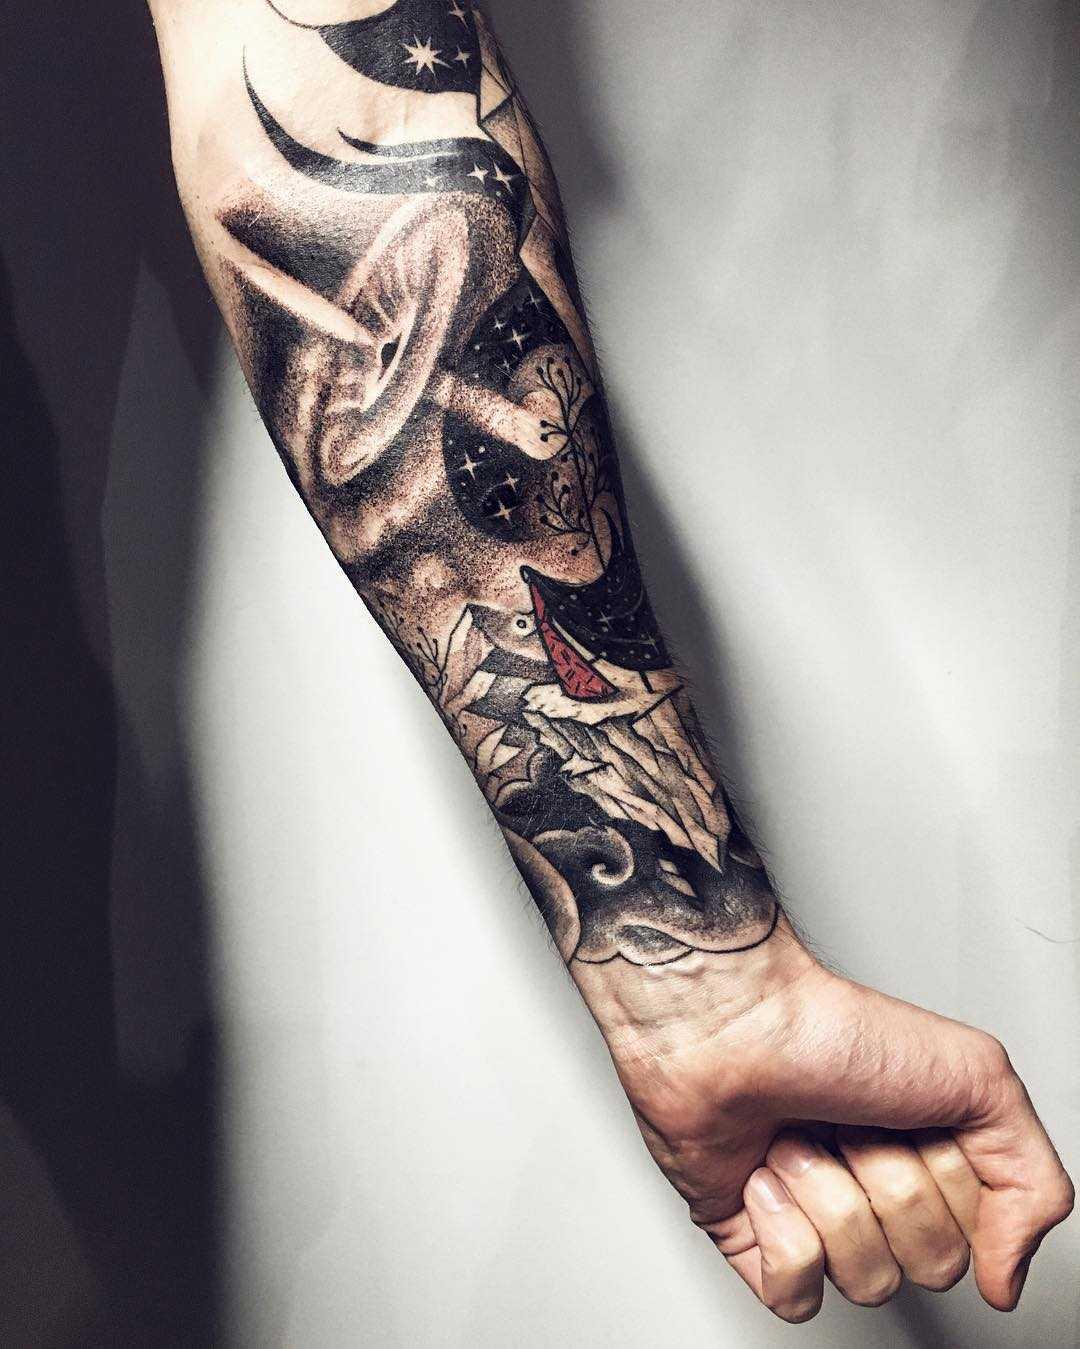 Black hole tattoo by Sasha Tattooing